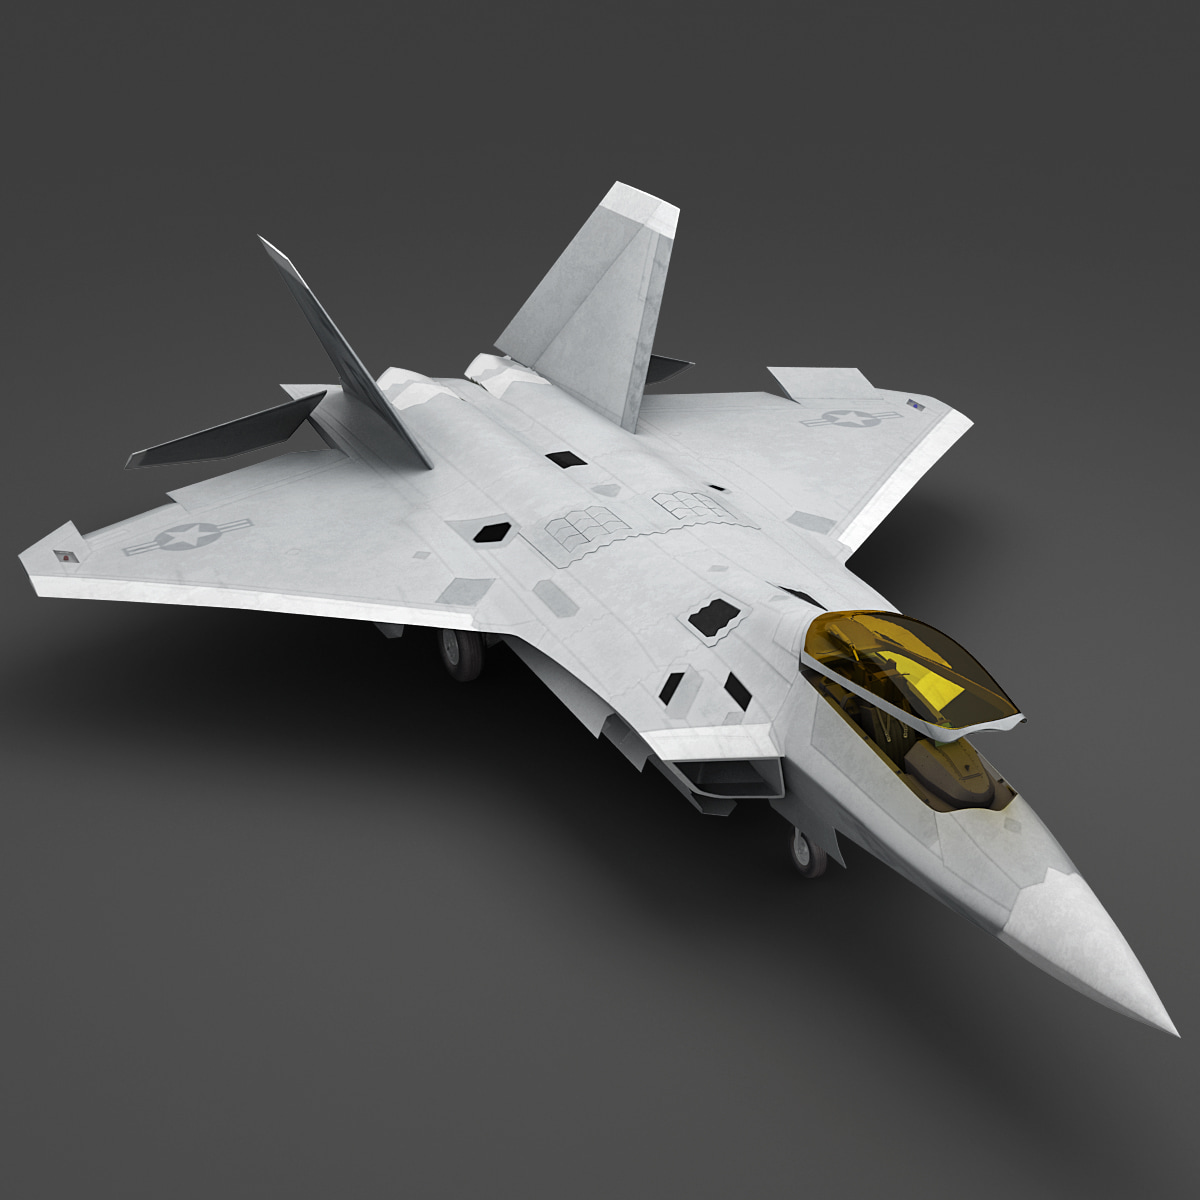 F-22_Raptor_V2_Rigged_0001.jpg